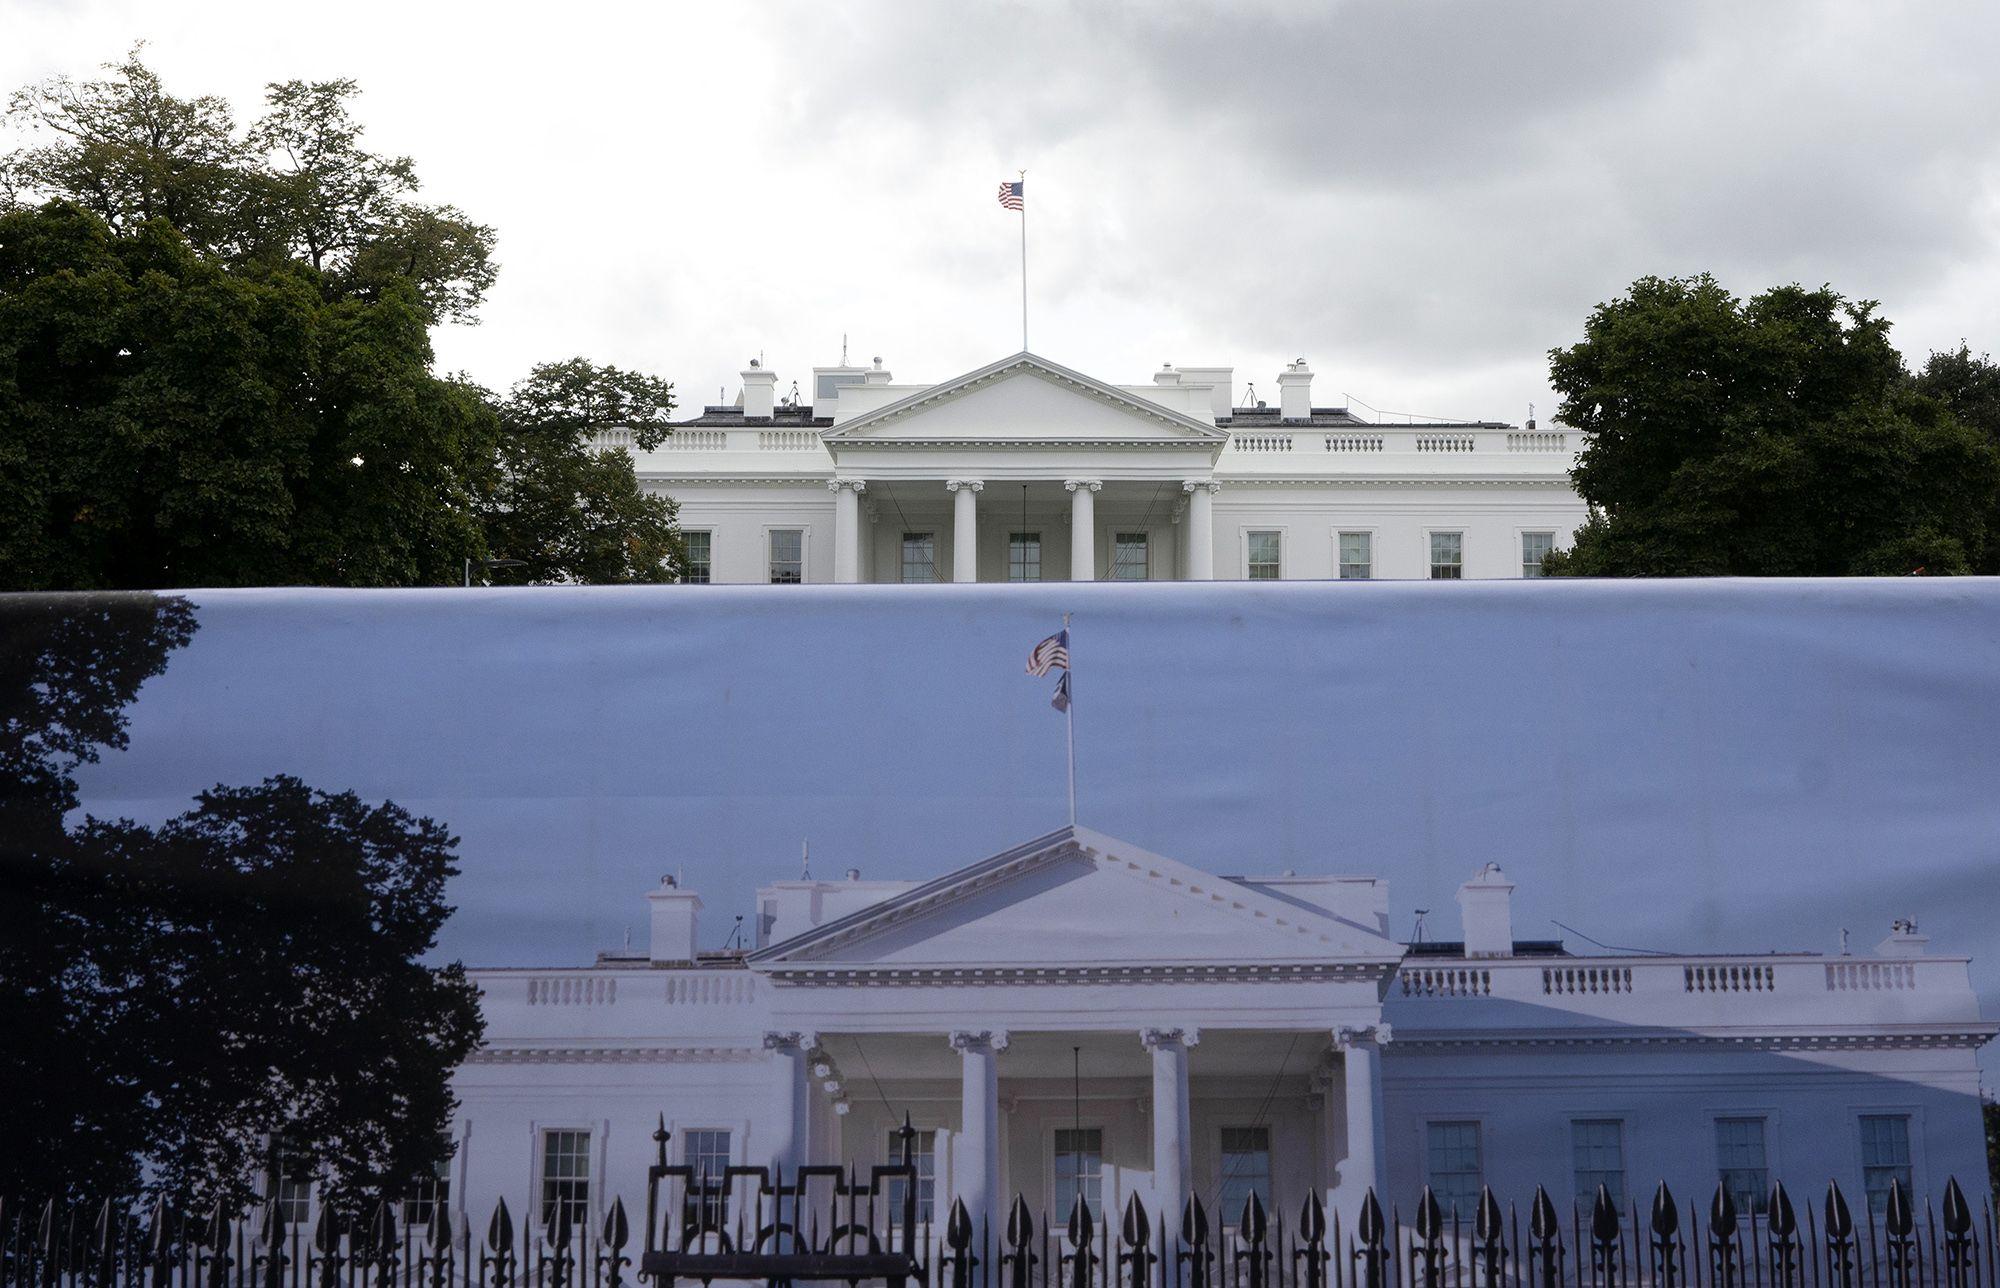 Congress ConsidersDelaying Spending Talks UntilAfter Impeachment